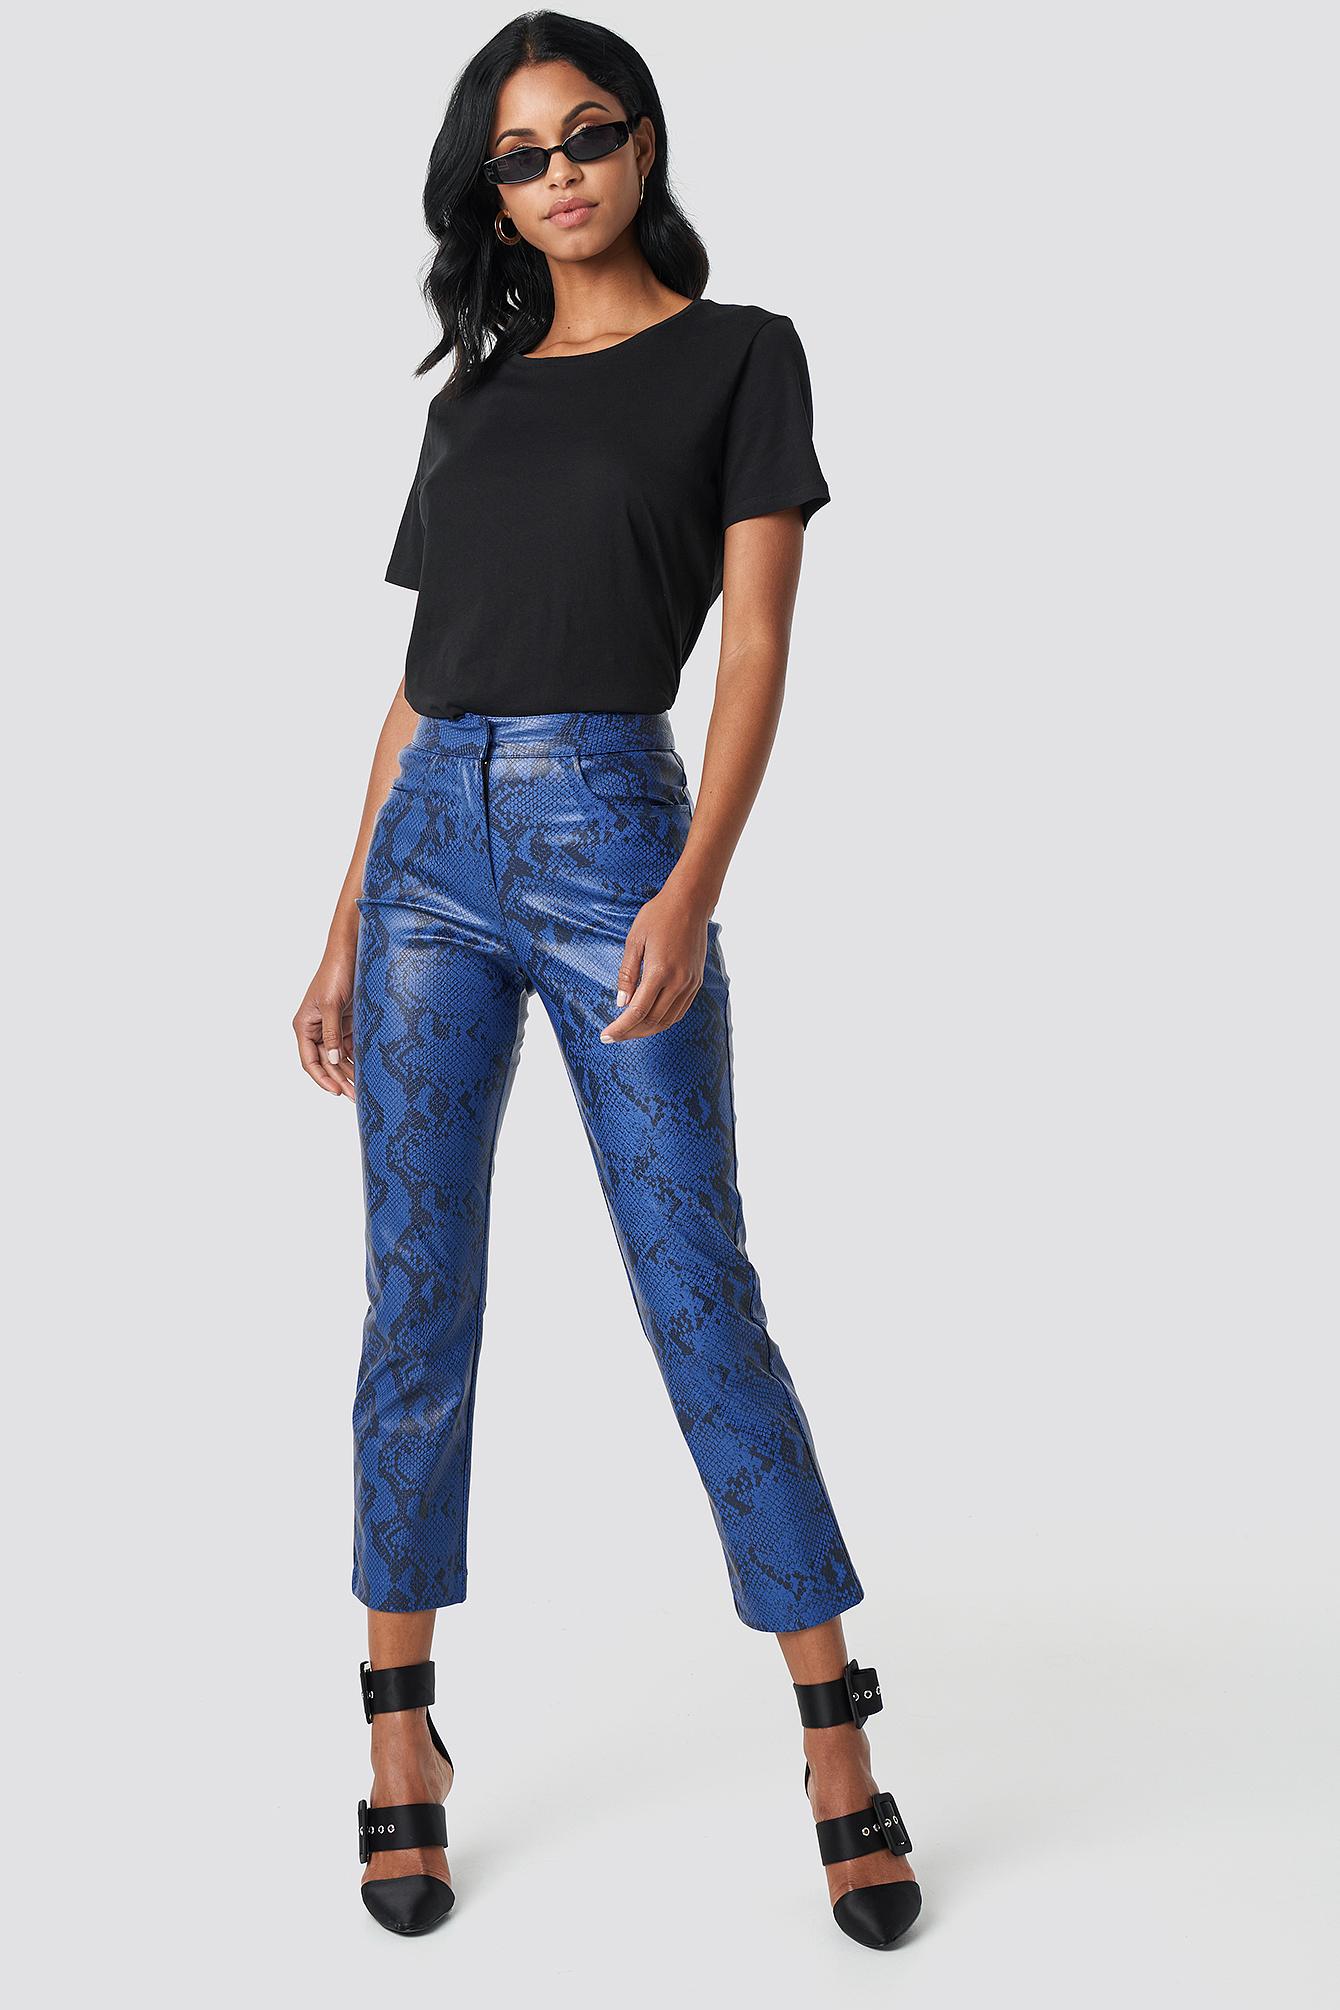 na-kd trend -  Snake Printed PU Pants - Blue